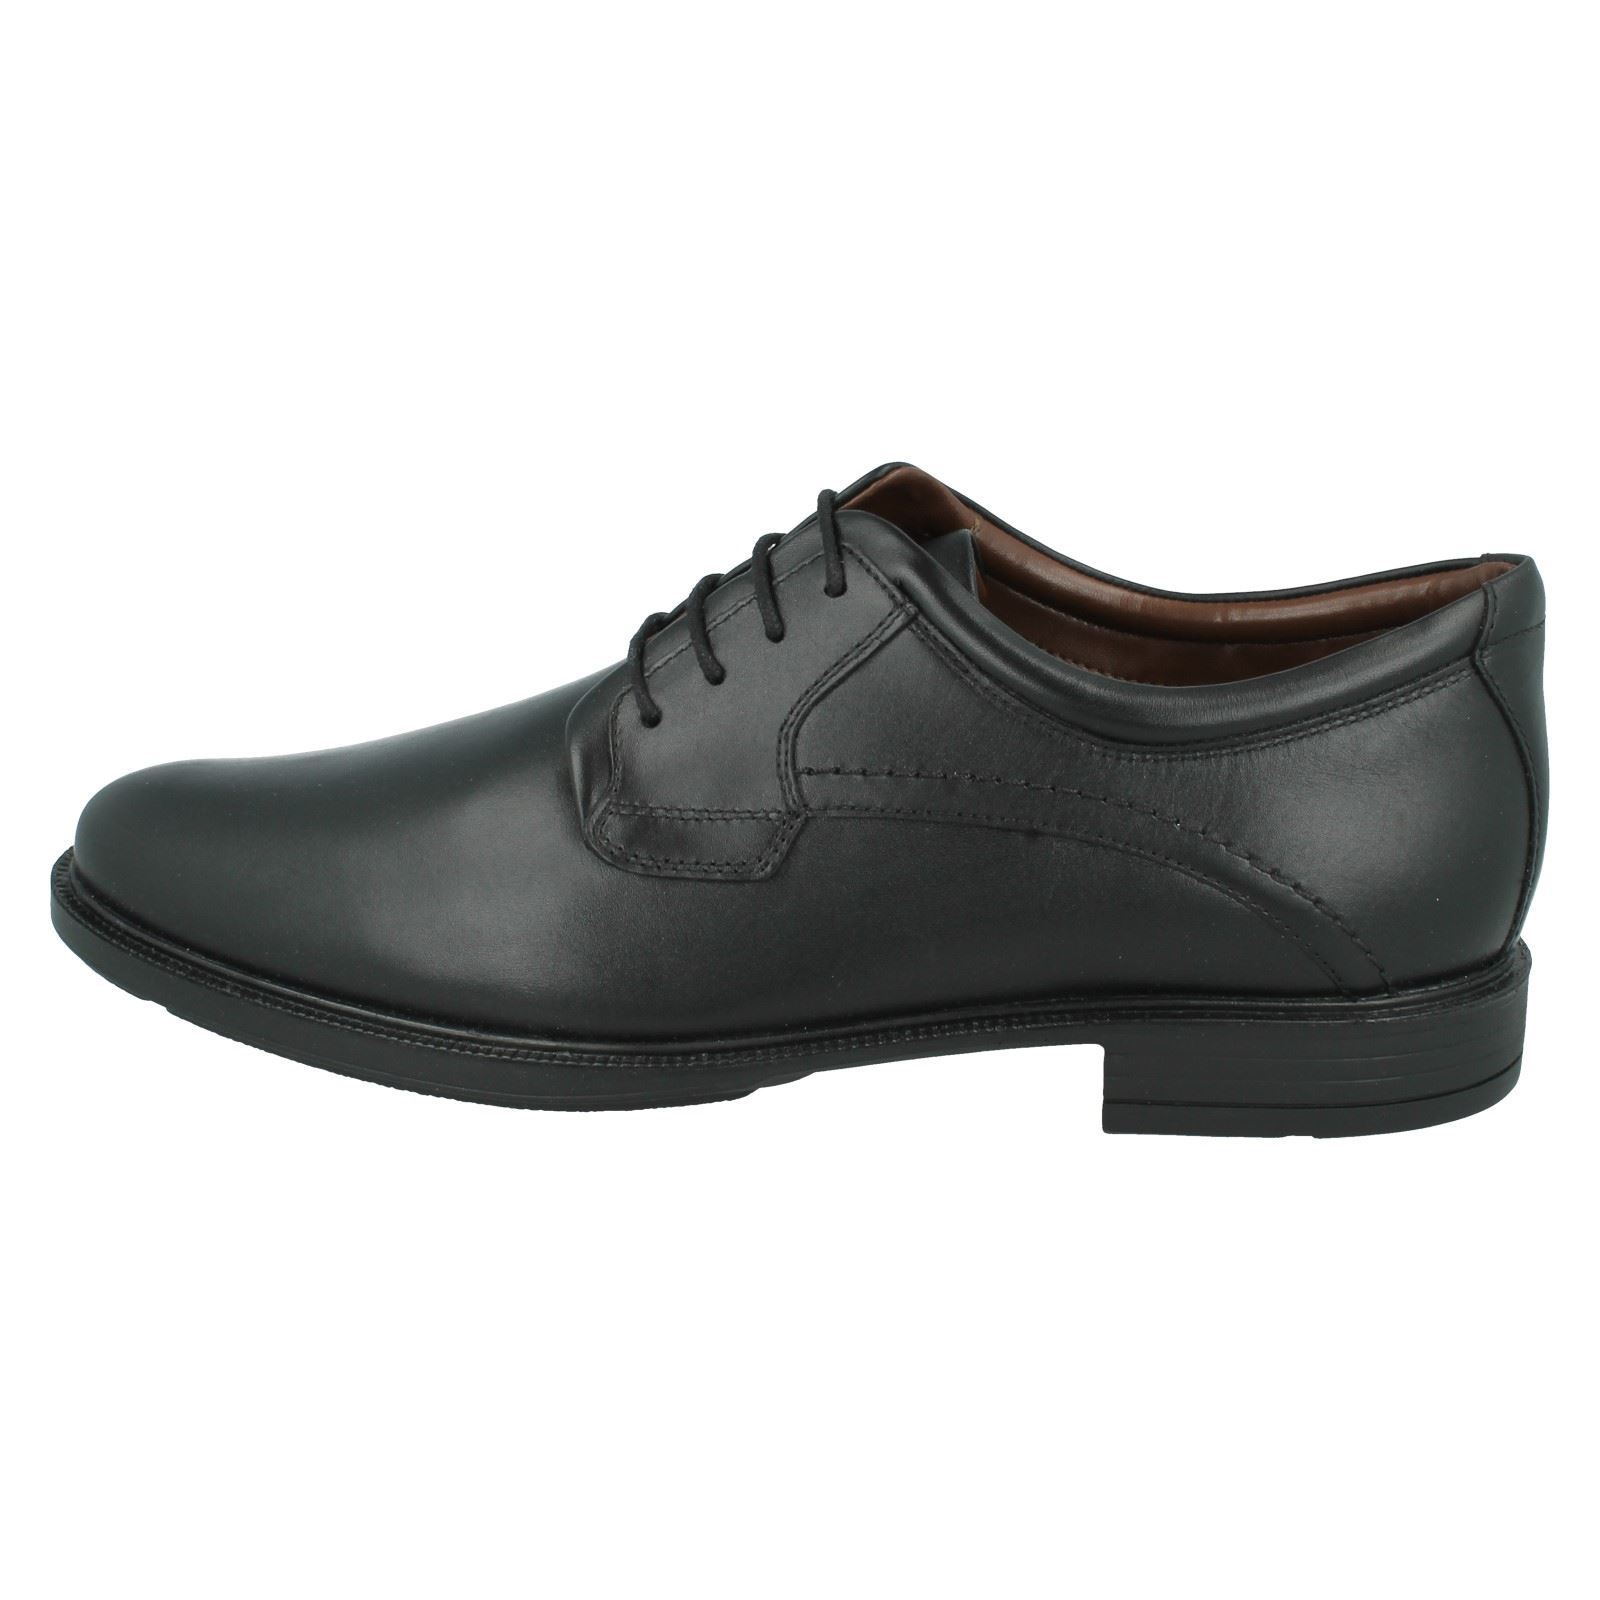 K Style Hush ~ Puppies Black Michigan Formal Shoes Men's 3 gxAwUPOq